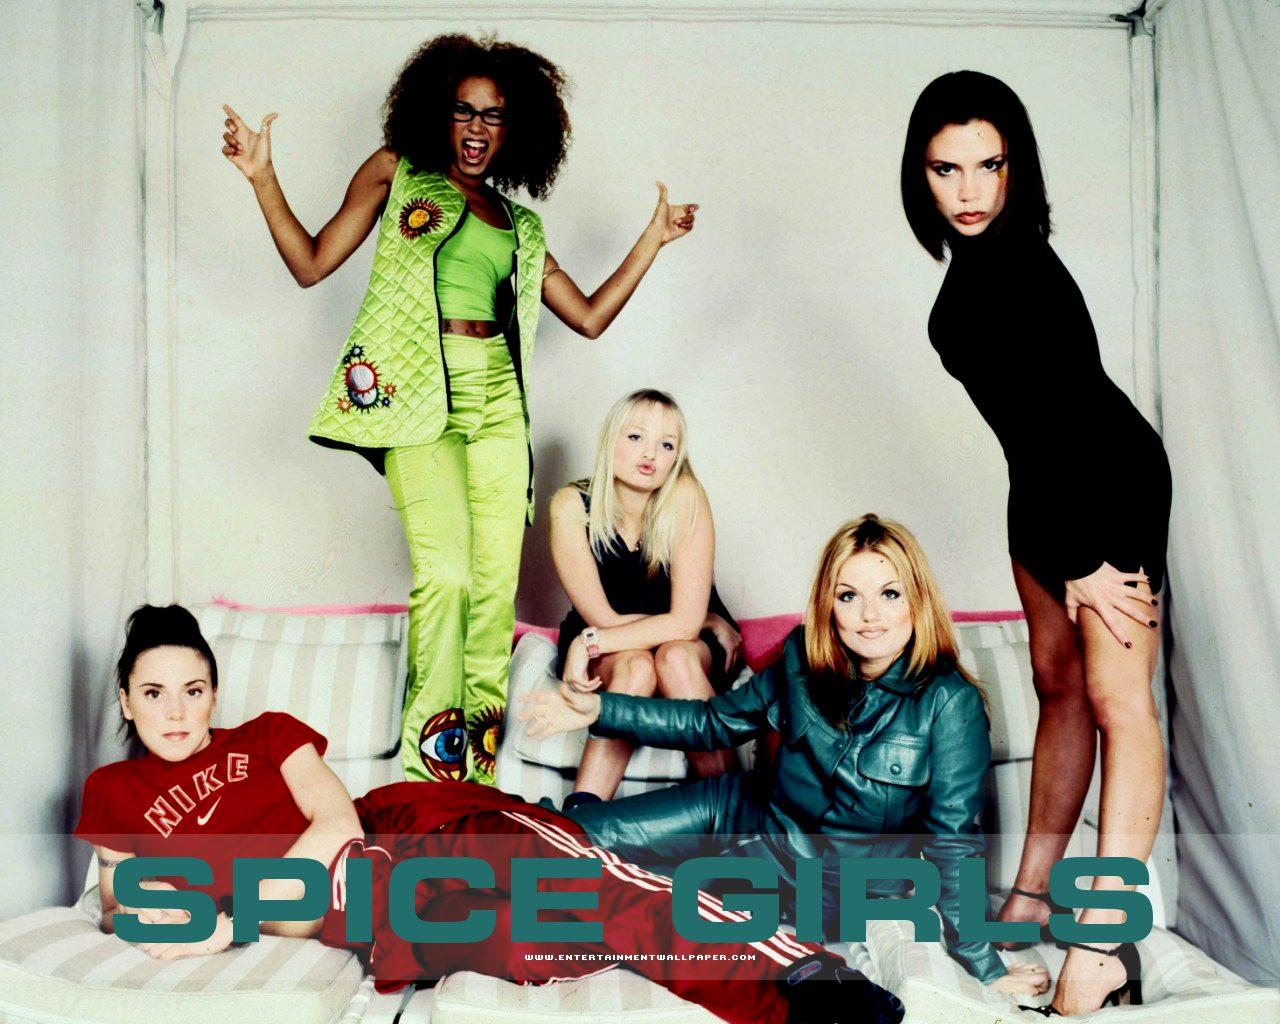 spice girls - photo #31